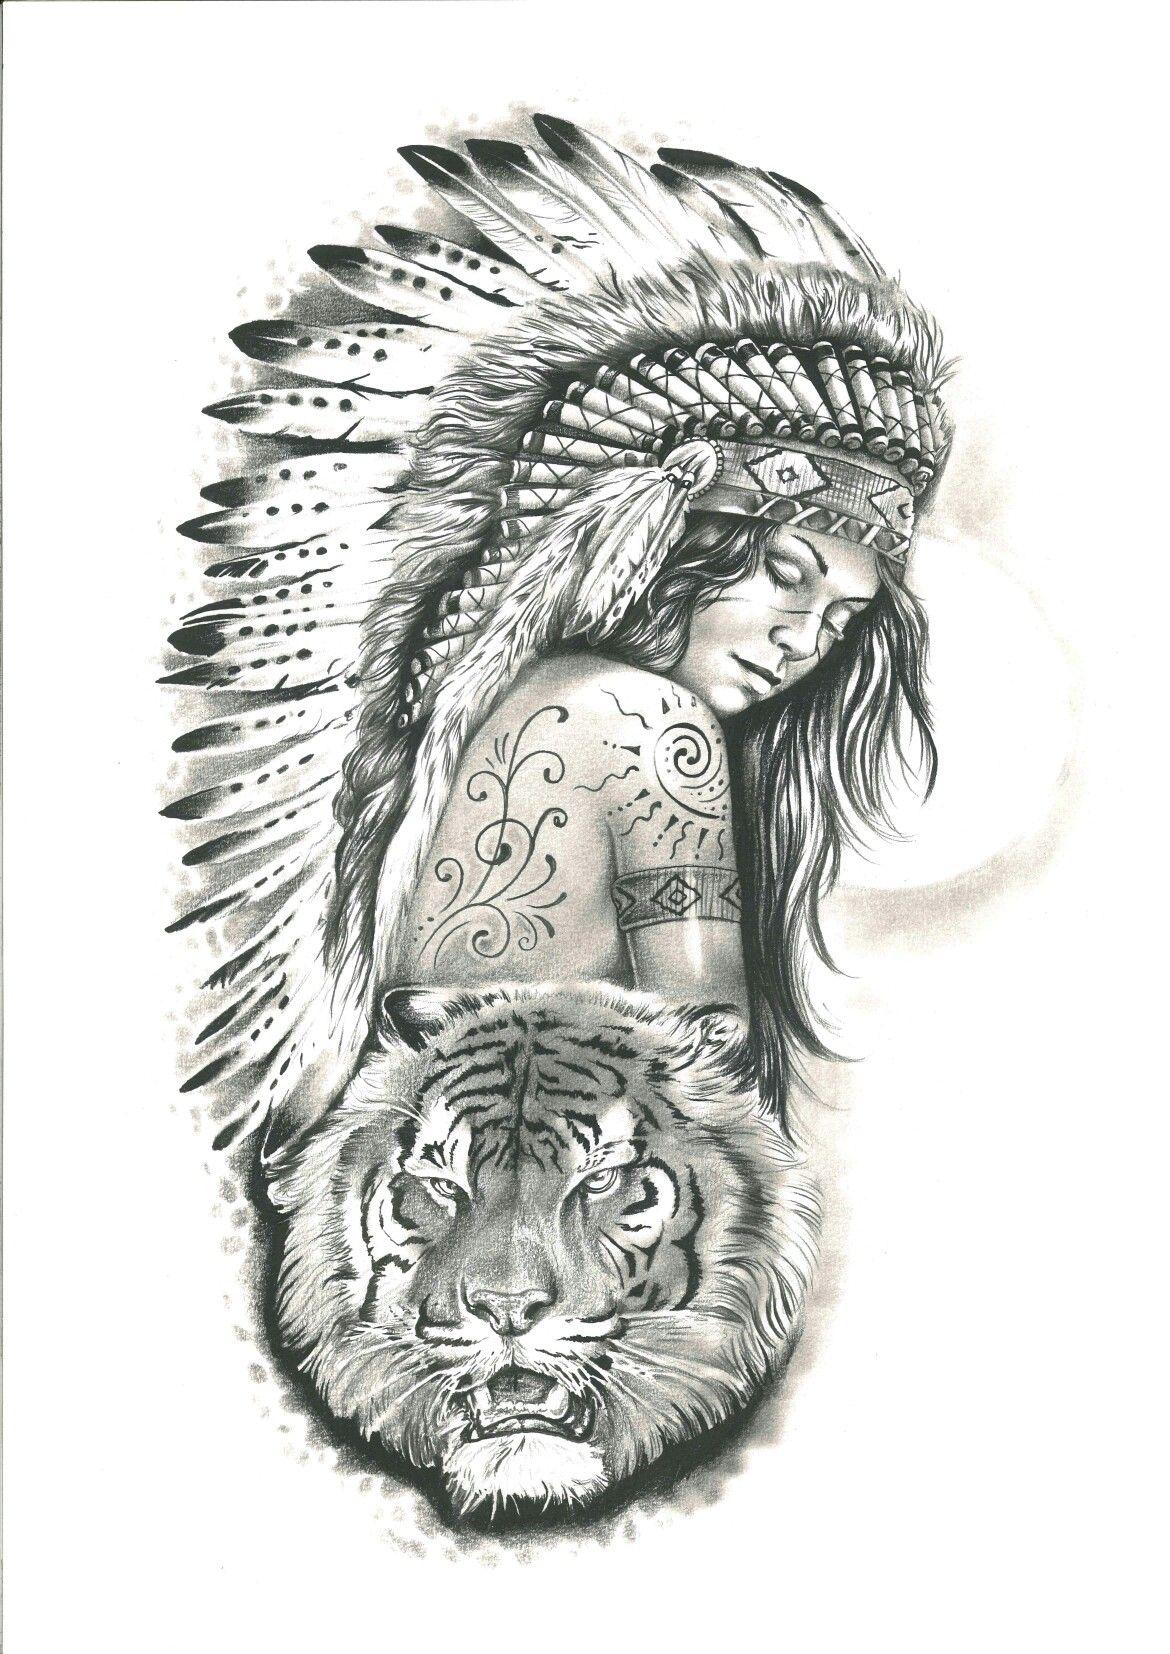 India Tattoo Tigre Desenho Tatuagem Tatuagens Indigenas